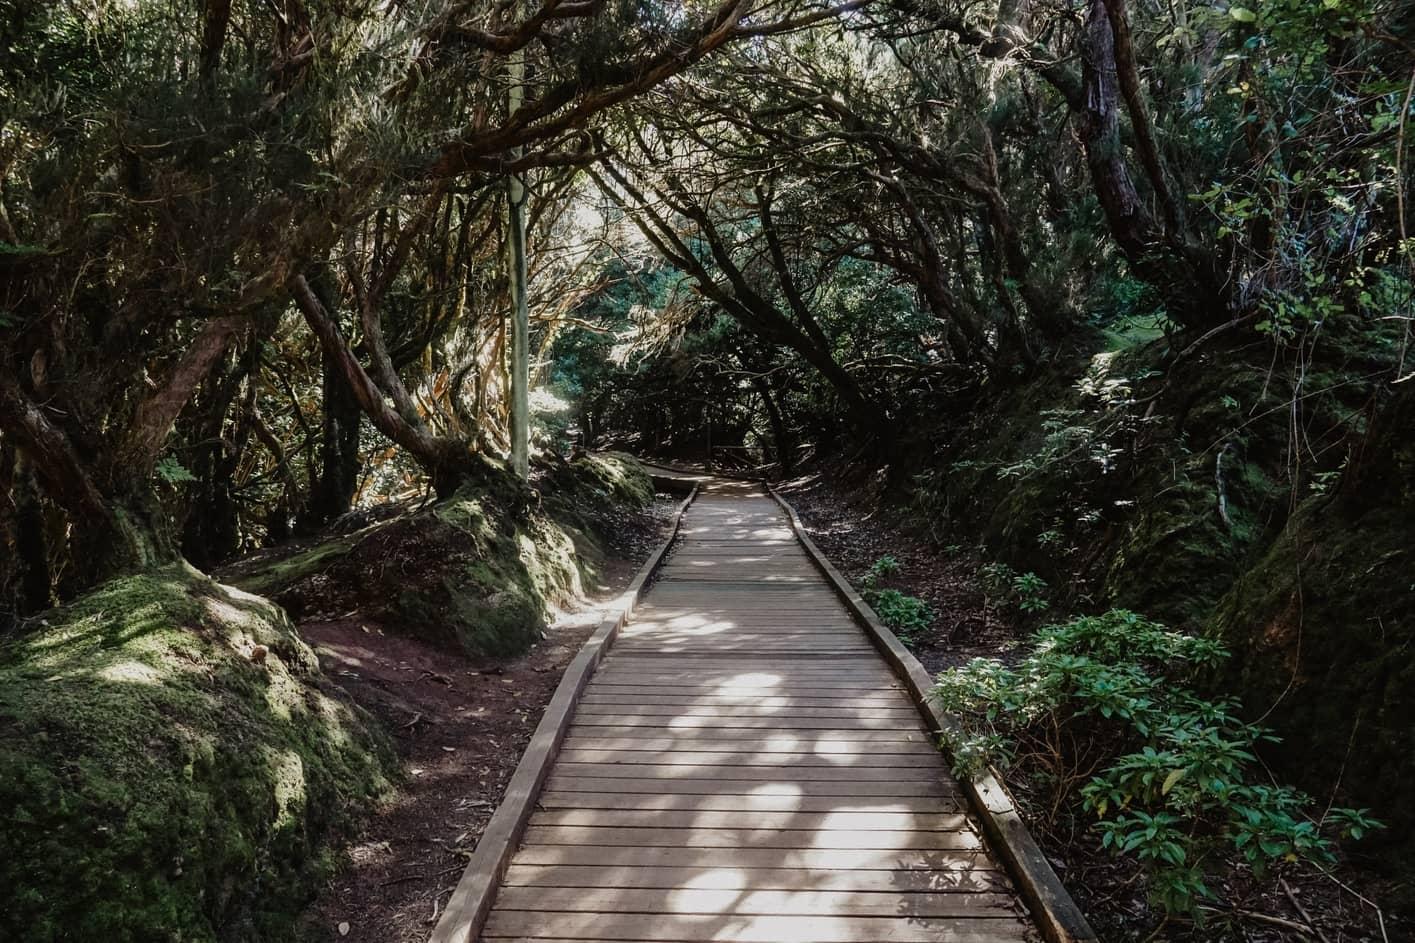 Trail of the Senses, Anaga, Tenerife